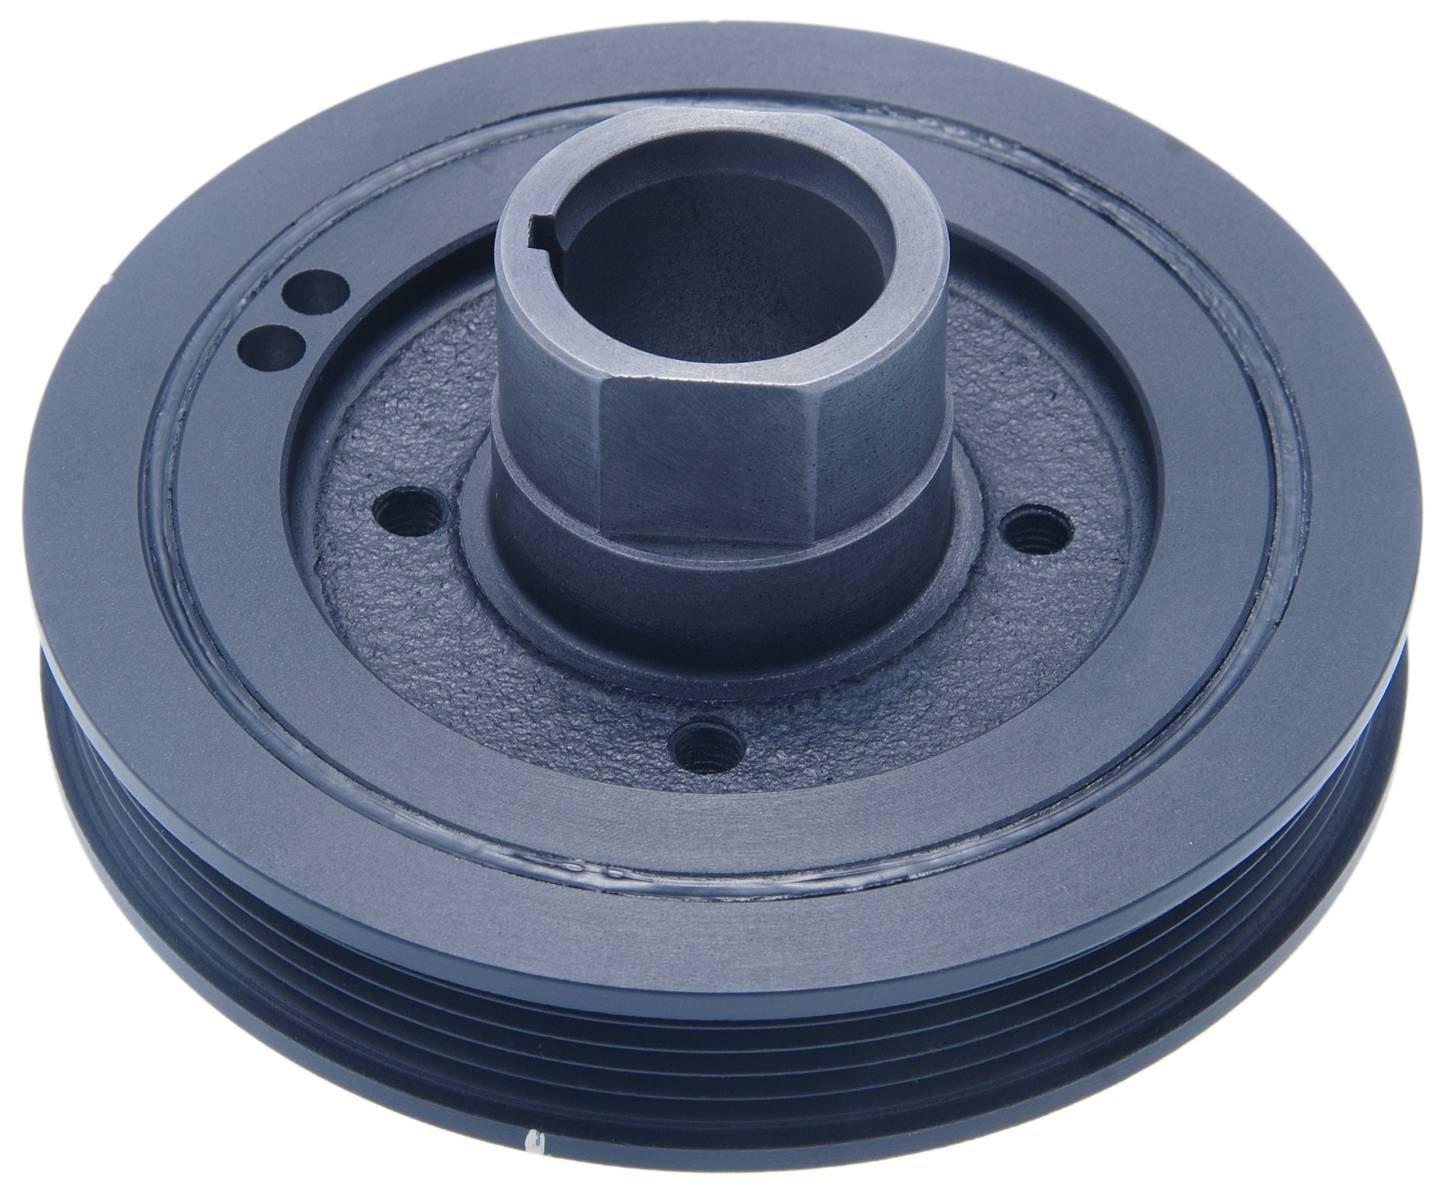 13408-75030 / 1340875030 - Crankshaft Pulley Engine 3Rzfe For Toyota Febest